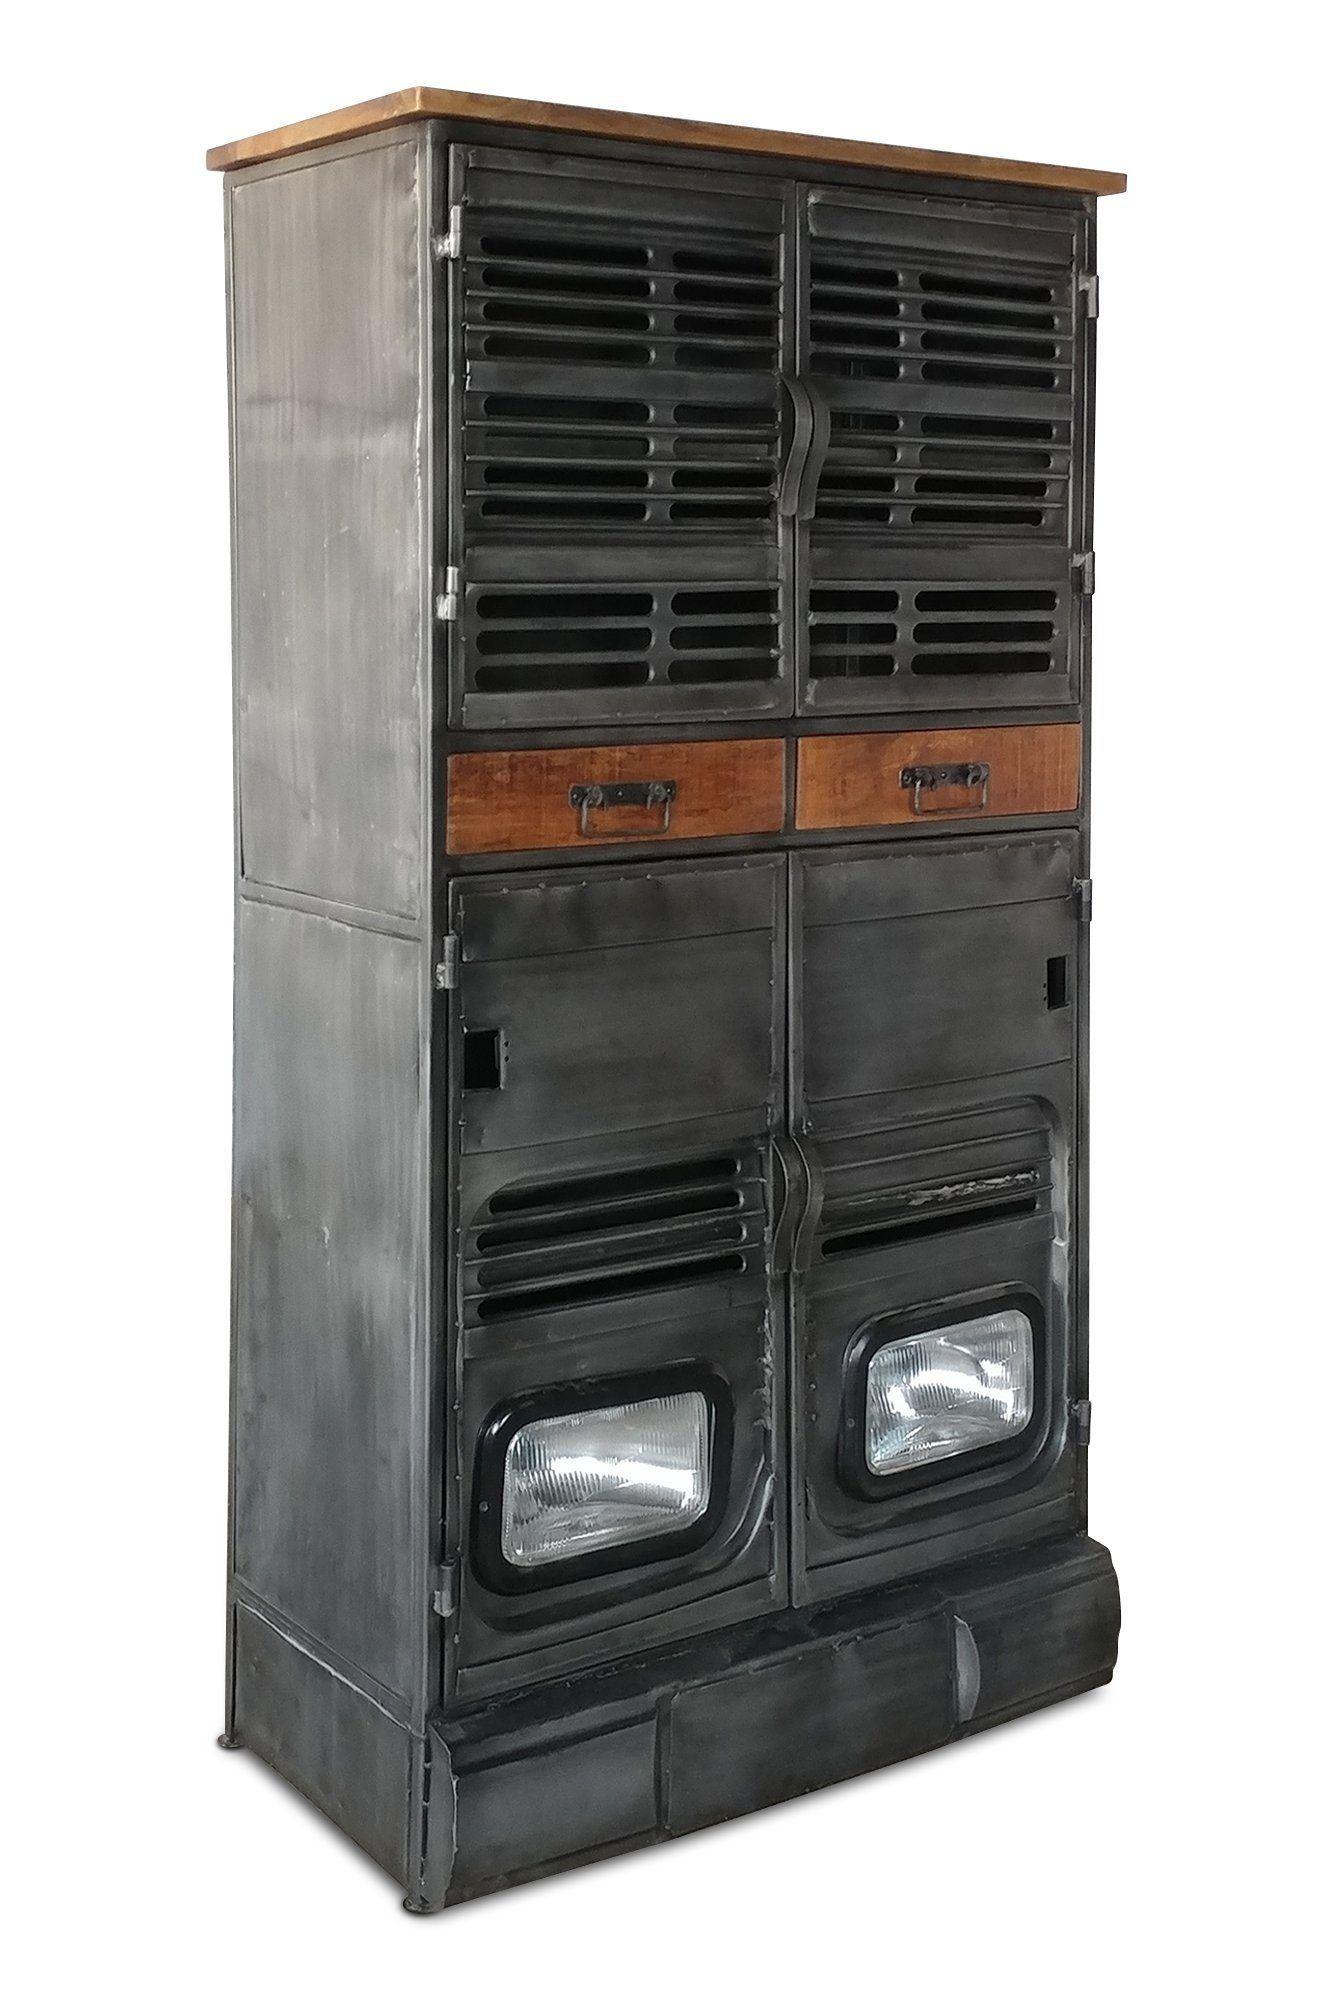 Industrial Storage Cabinet Vintage Truck Working Headlights Metal In 2020 Industrial Storage Cabinets Industrial Storage Metal Storage Cabinets